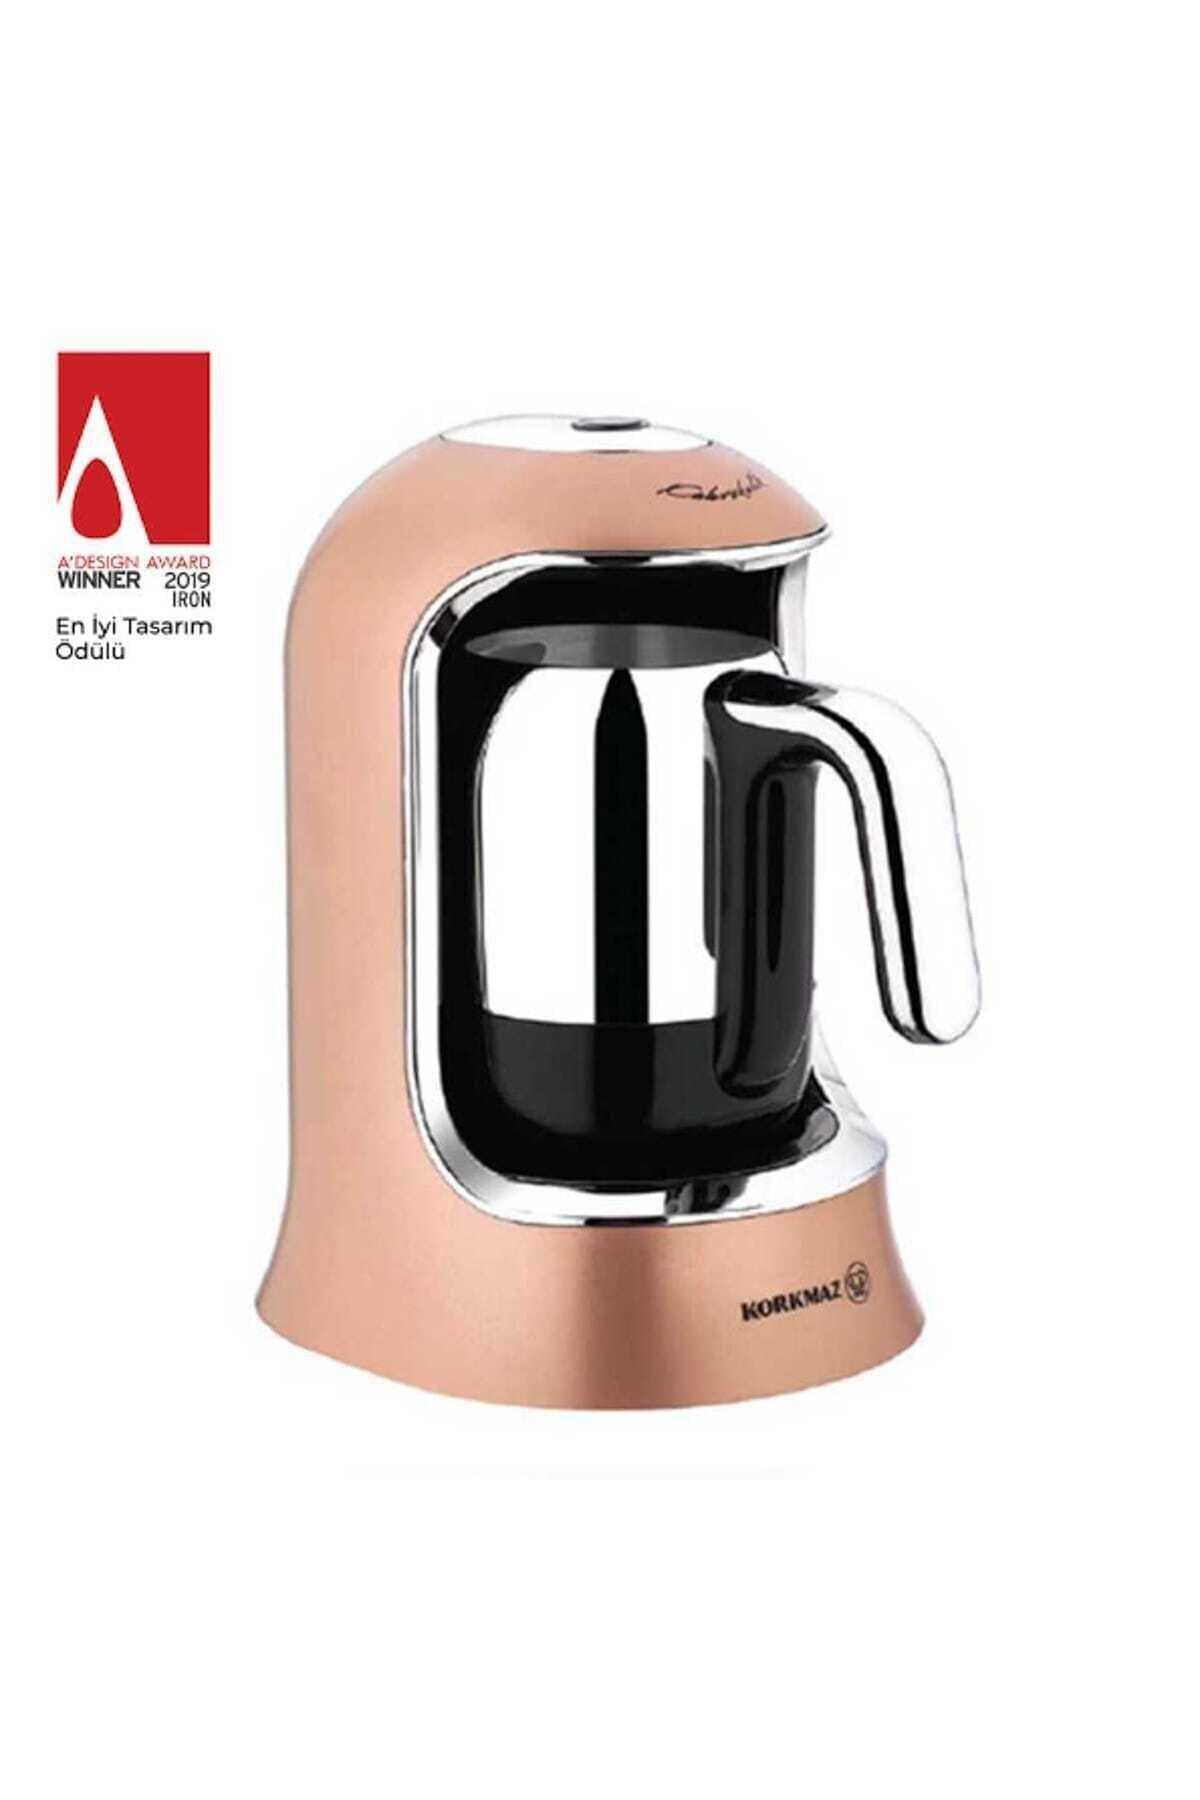 KORKMAZ Kahvekolik Rosegold Krom Otomatik Kahve Makinesi A860-06 2